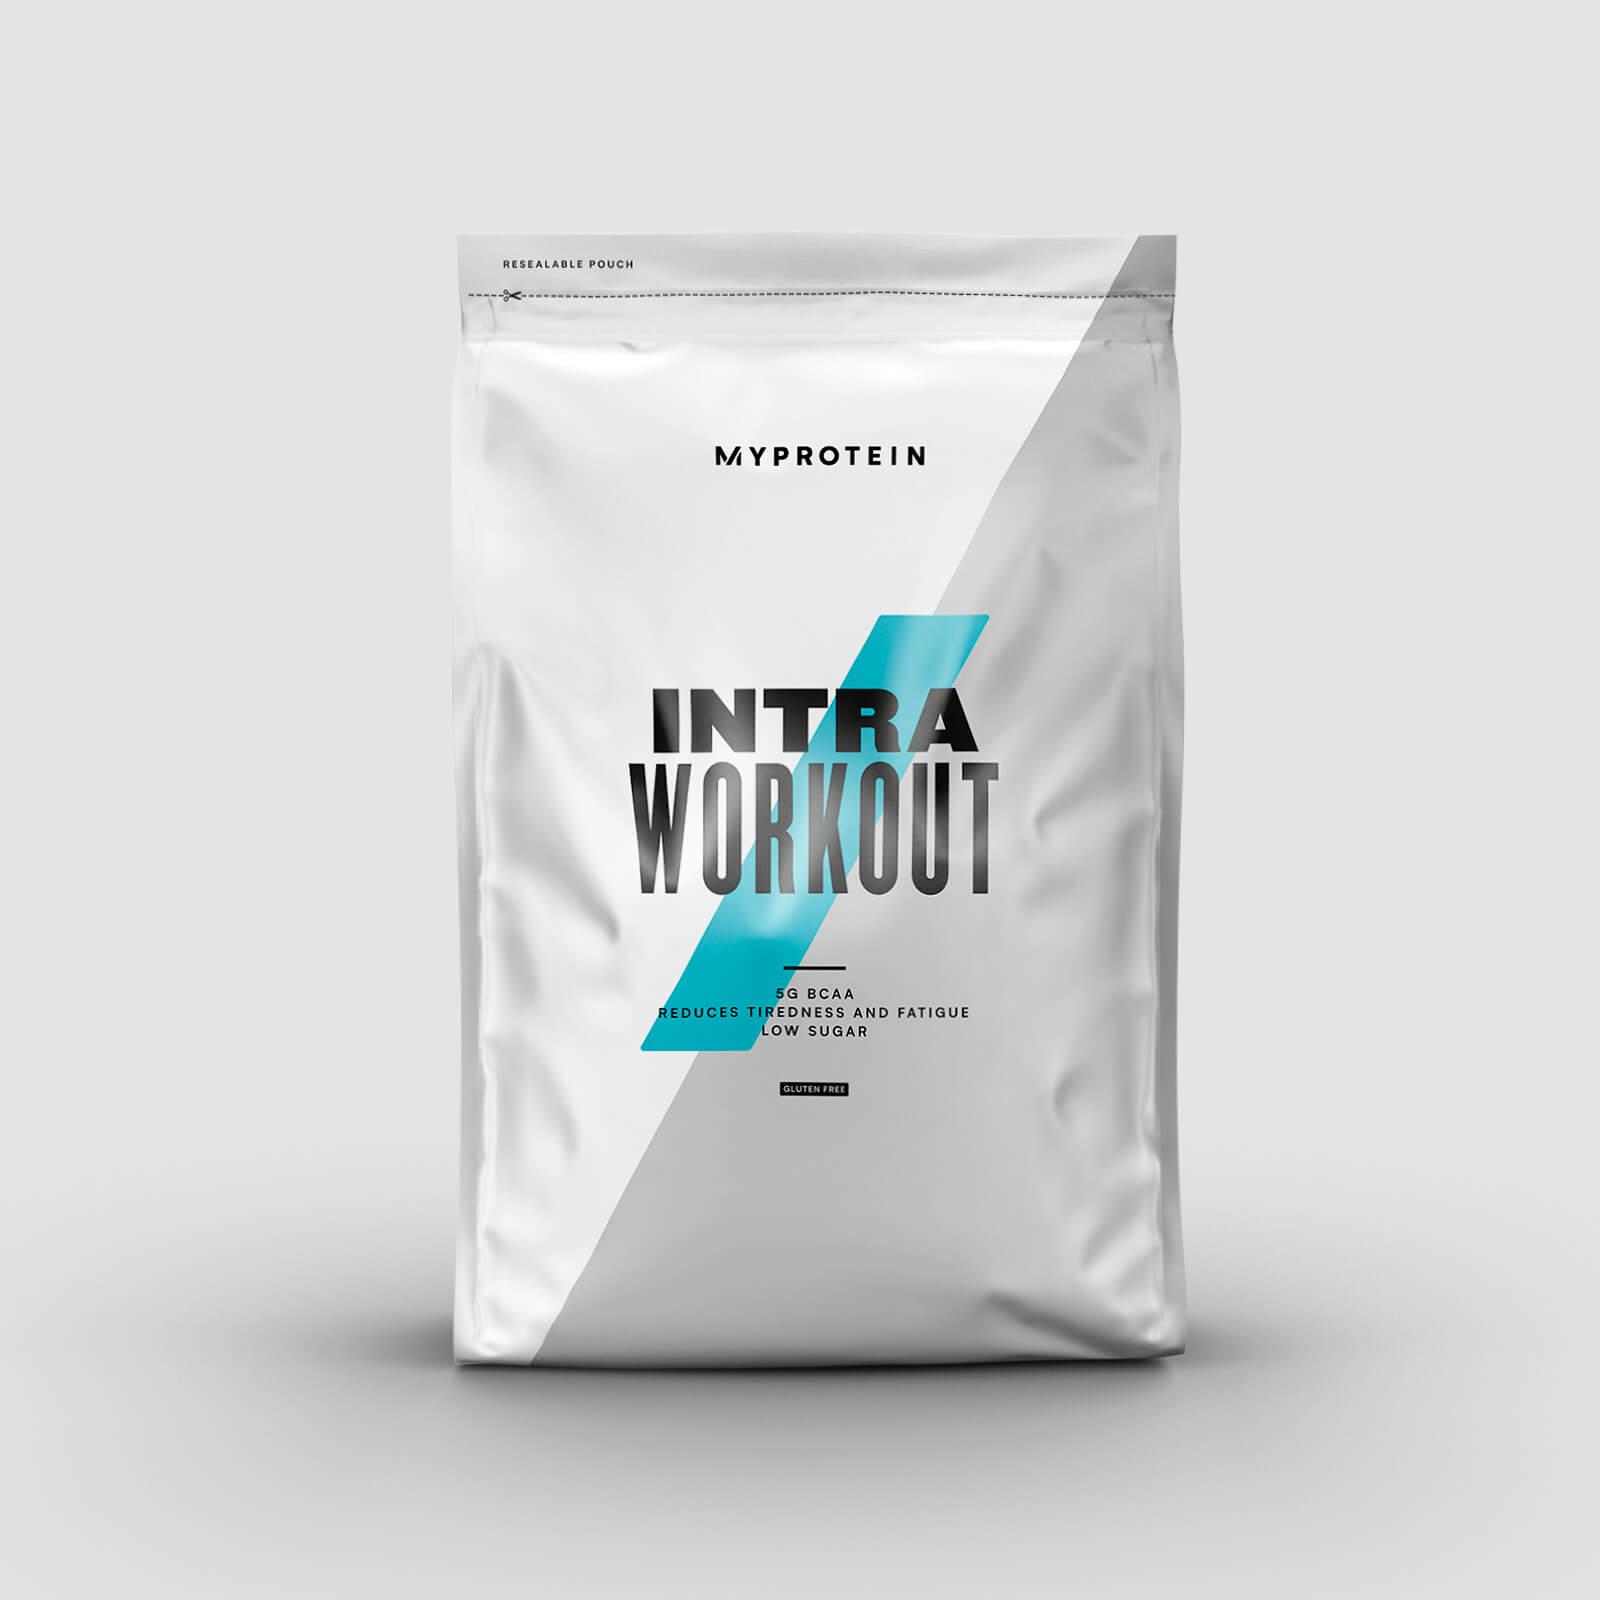 Myprotein Intra Workout - 1kg - Fragola e lime